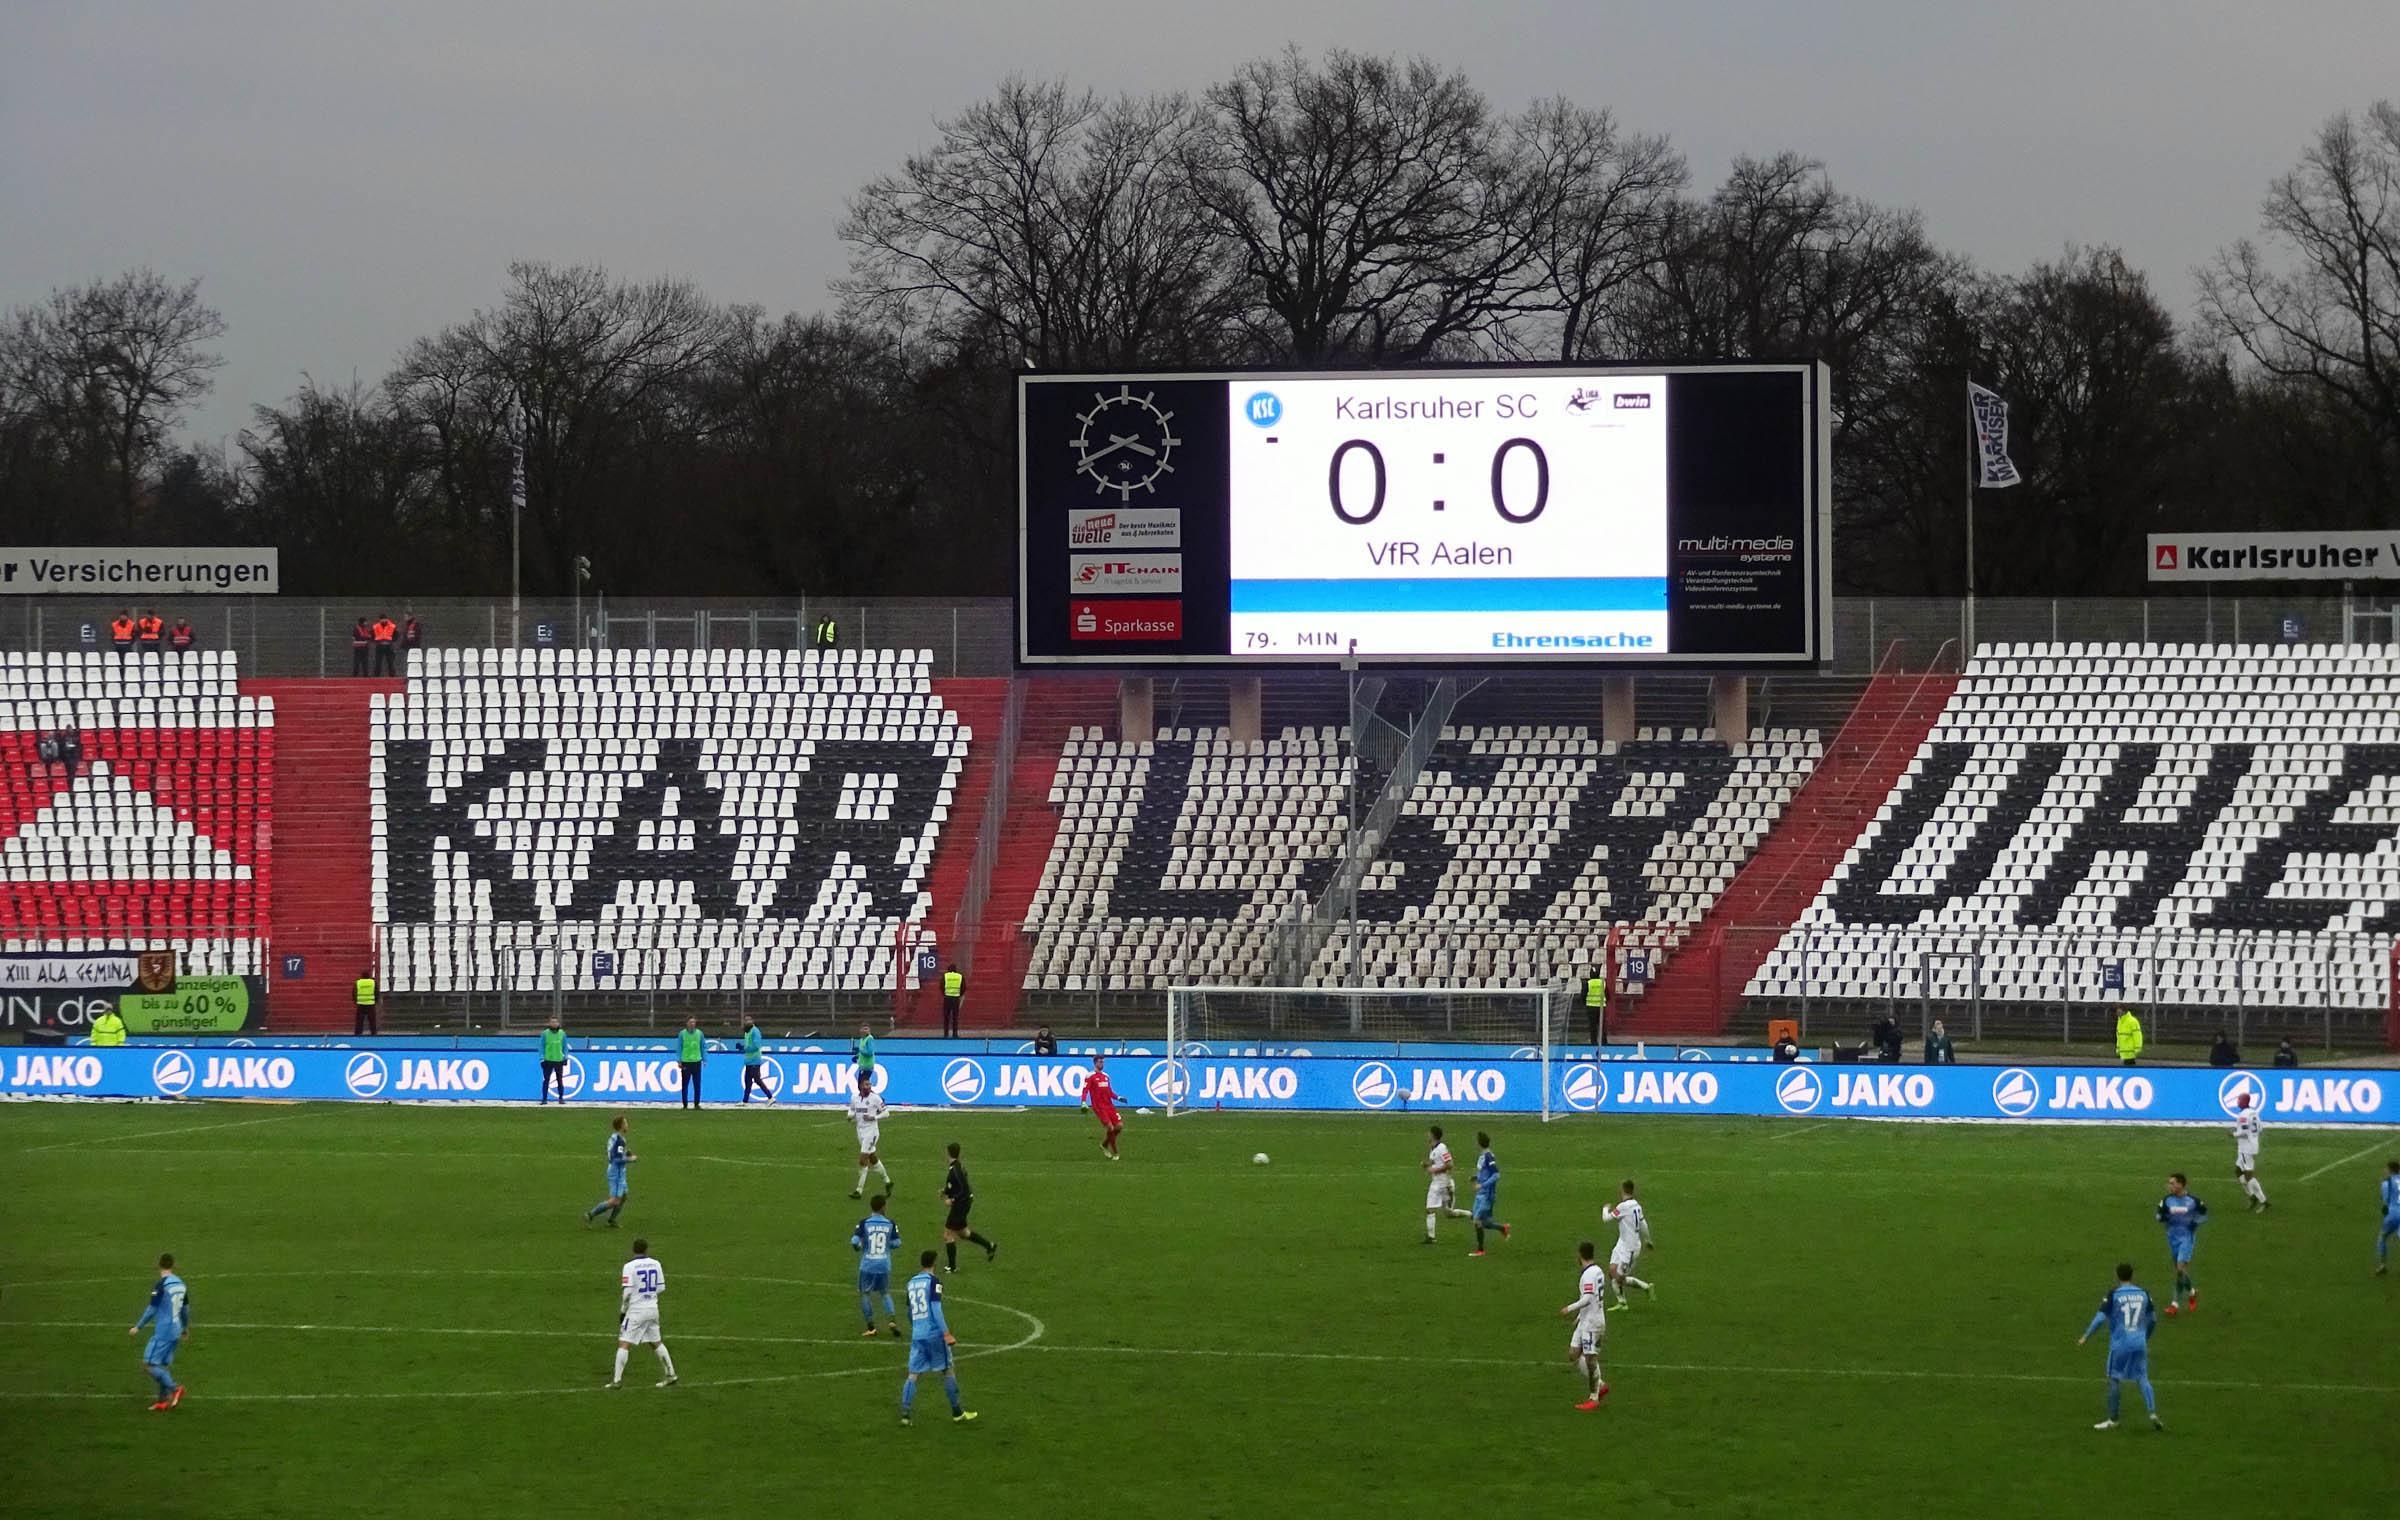 KSC vs VfR Aalen – Tore Fehlanzeige…